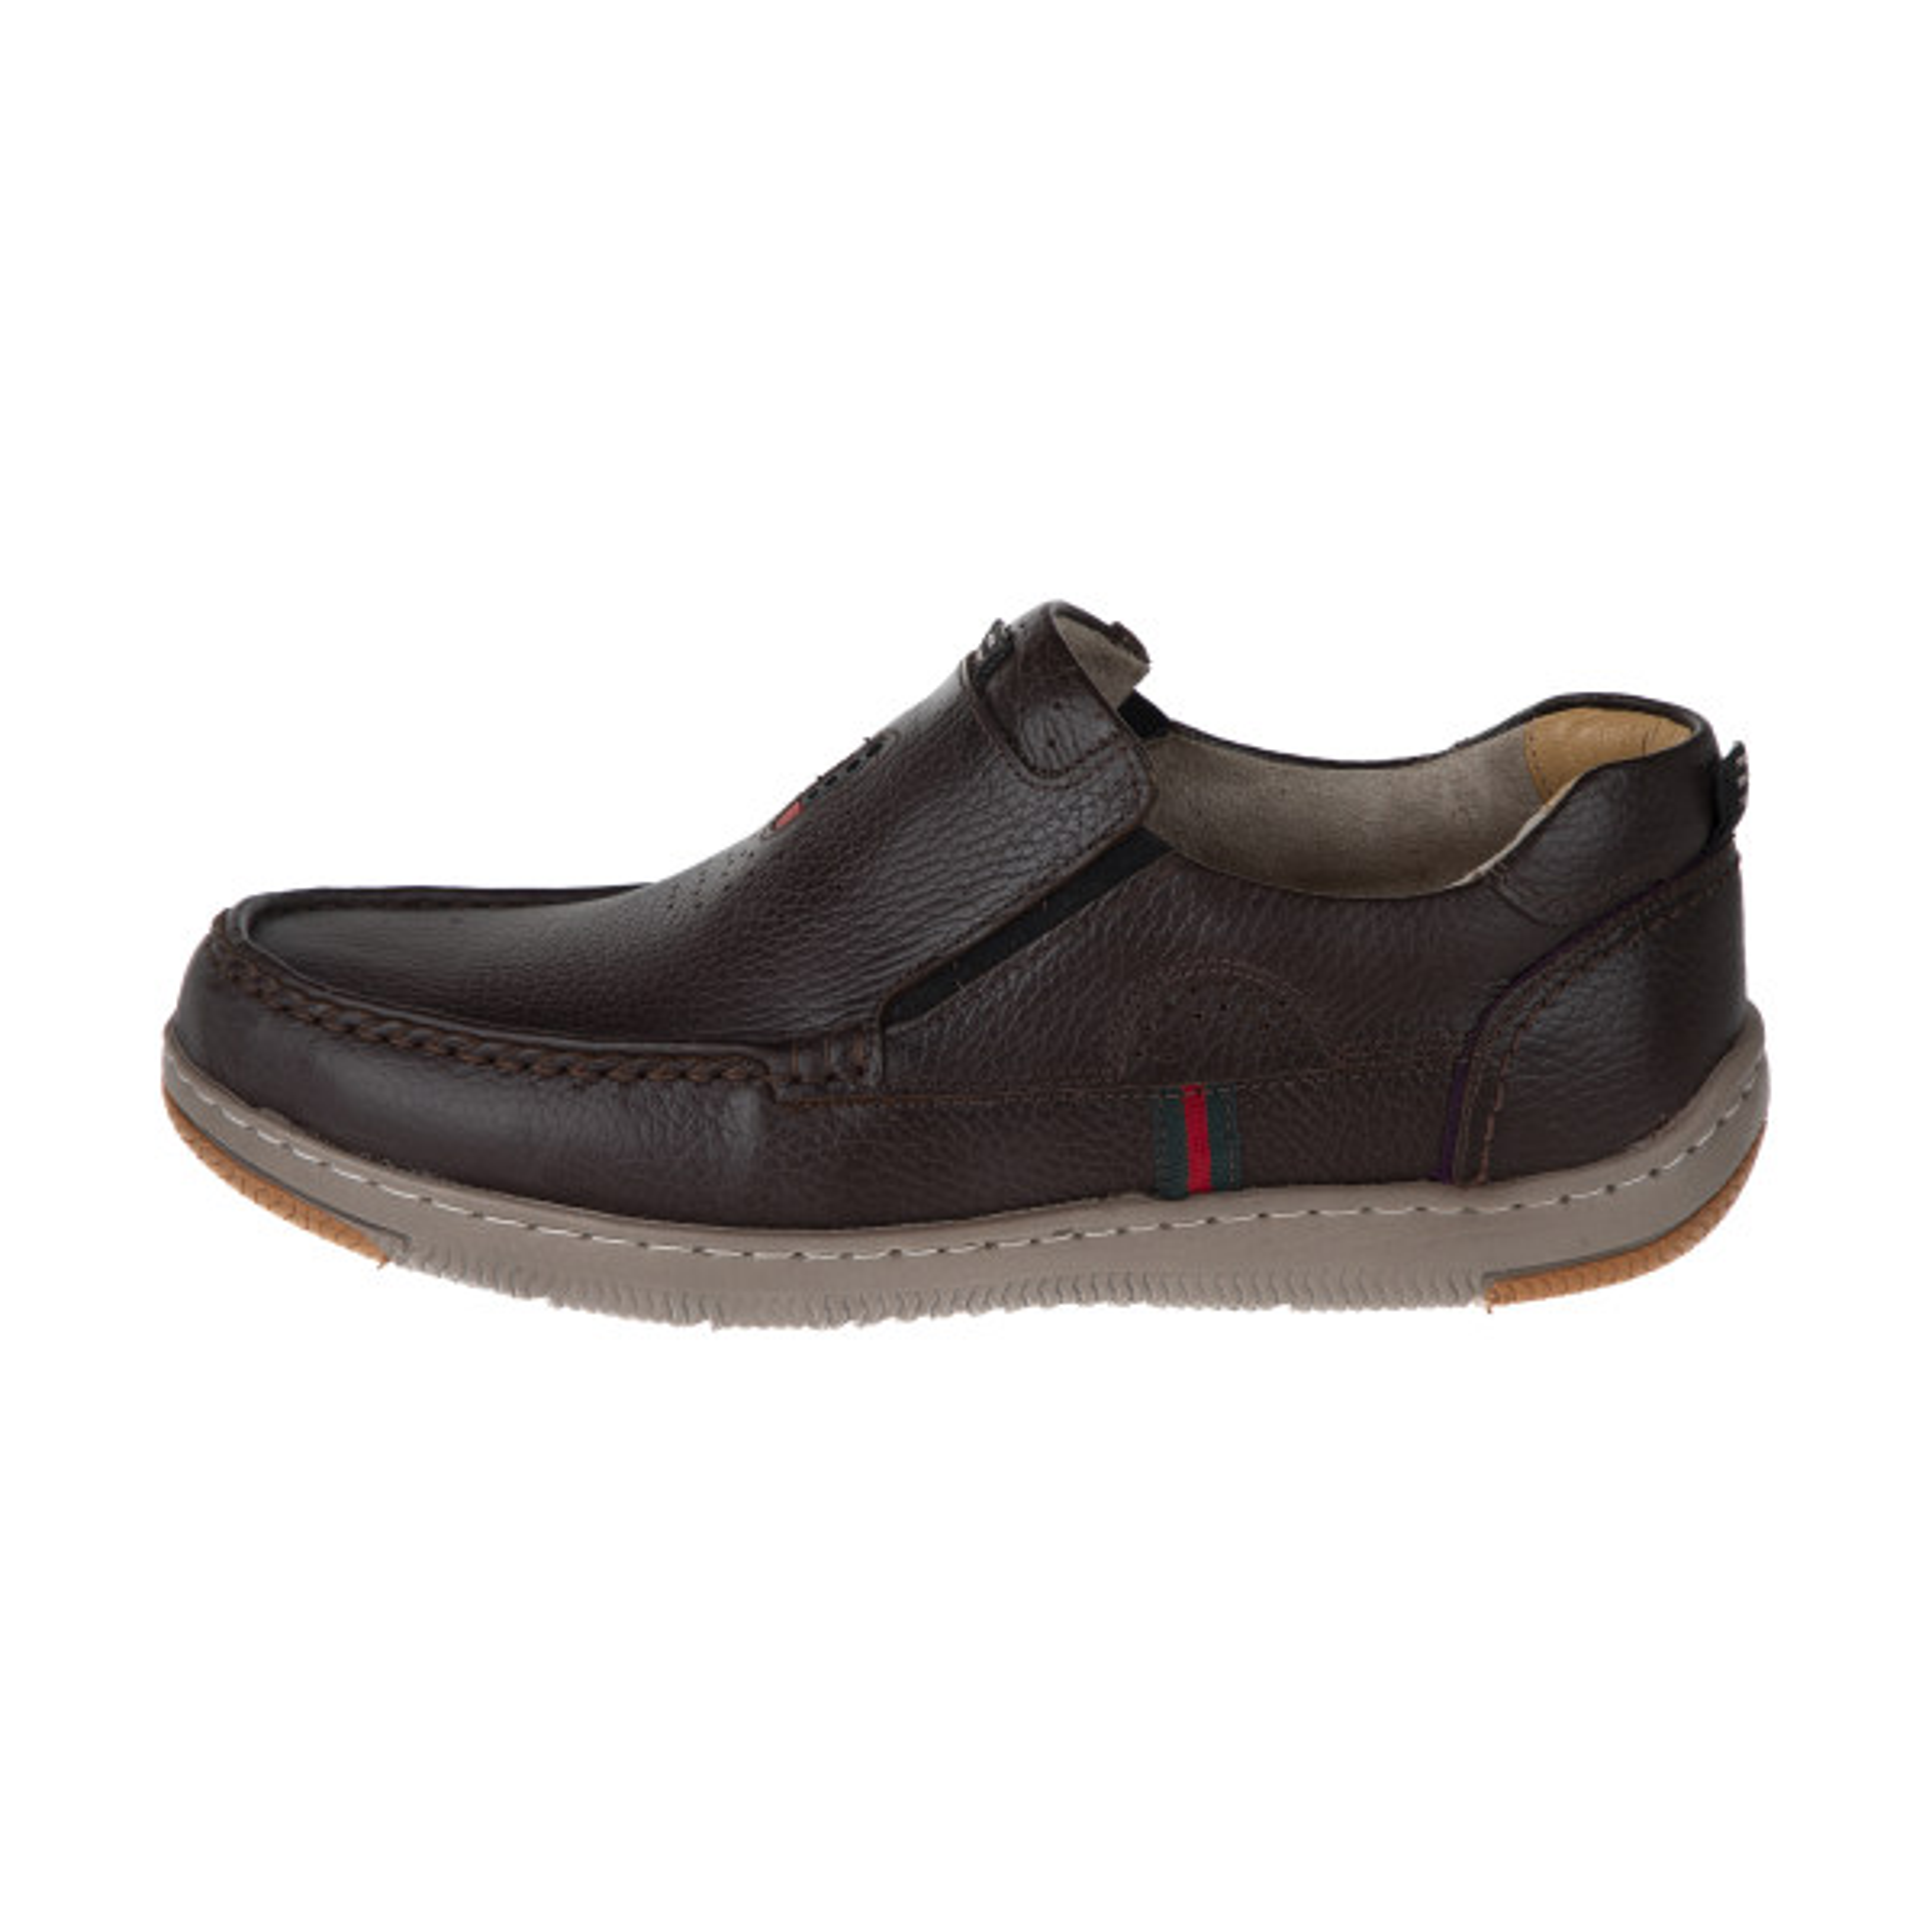 کفش روزمره مردانه ساتین مدل 7602A503104